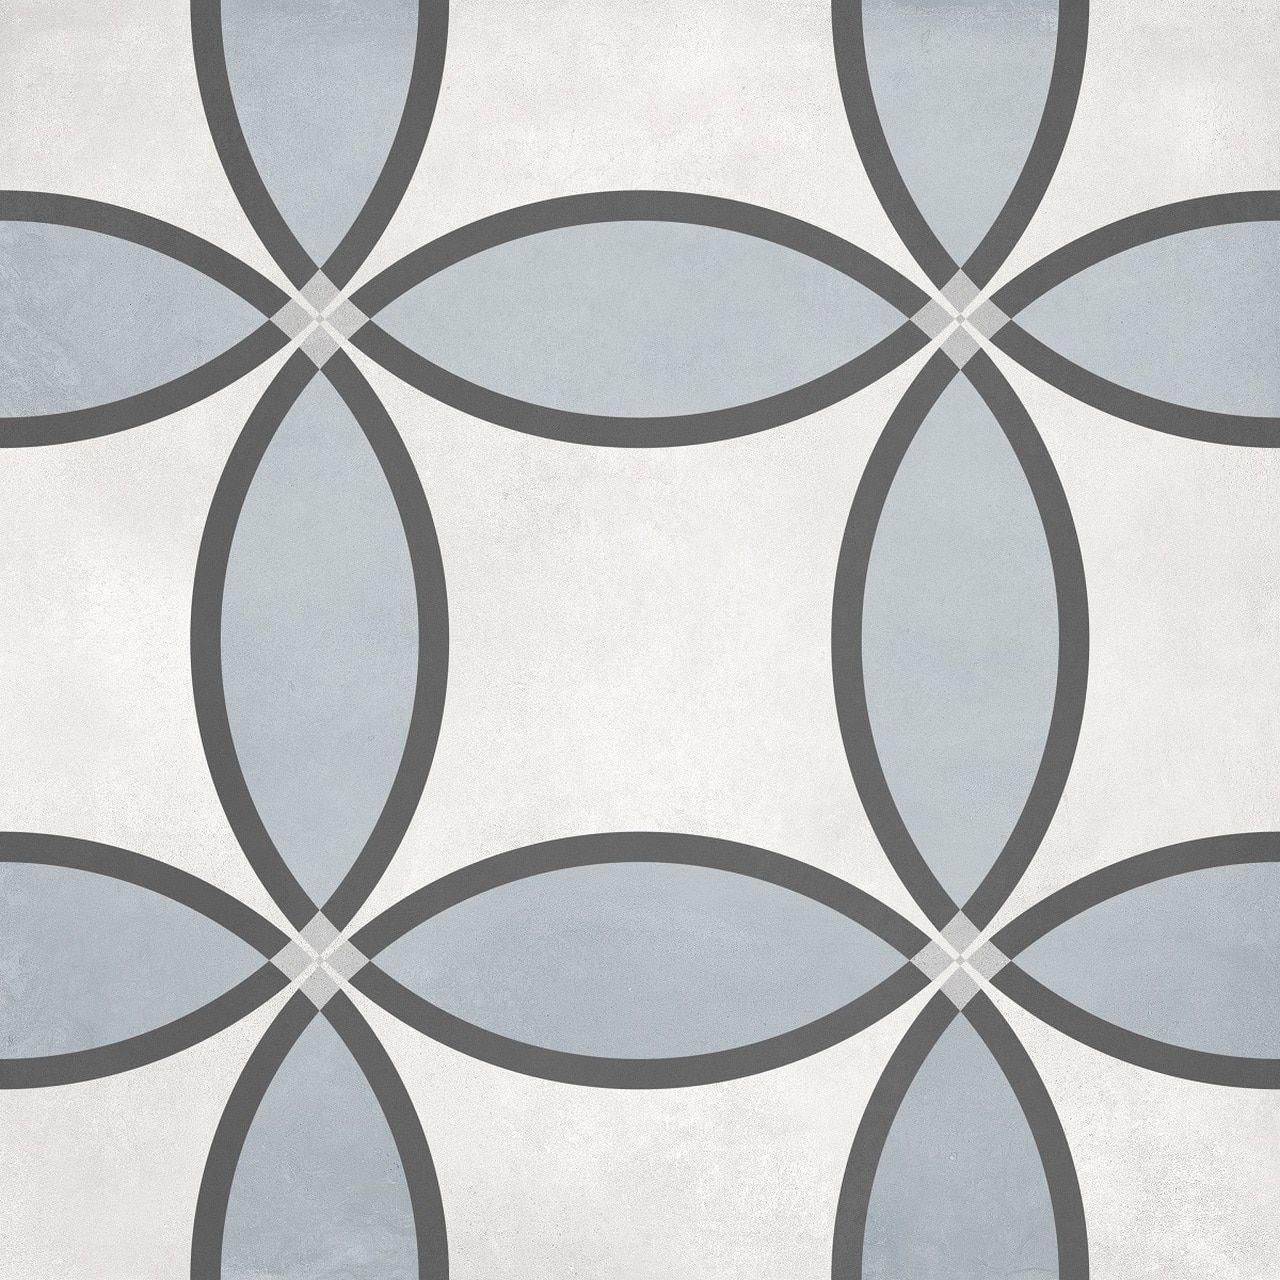 Form 8 X 8 Tide Zen Deco On Sale 3 49 Per Square Foot Porcelain Tile Floor And Wall Tile Wall Tiles